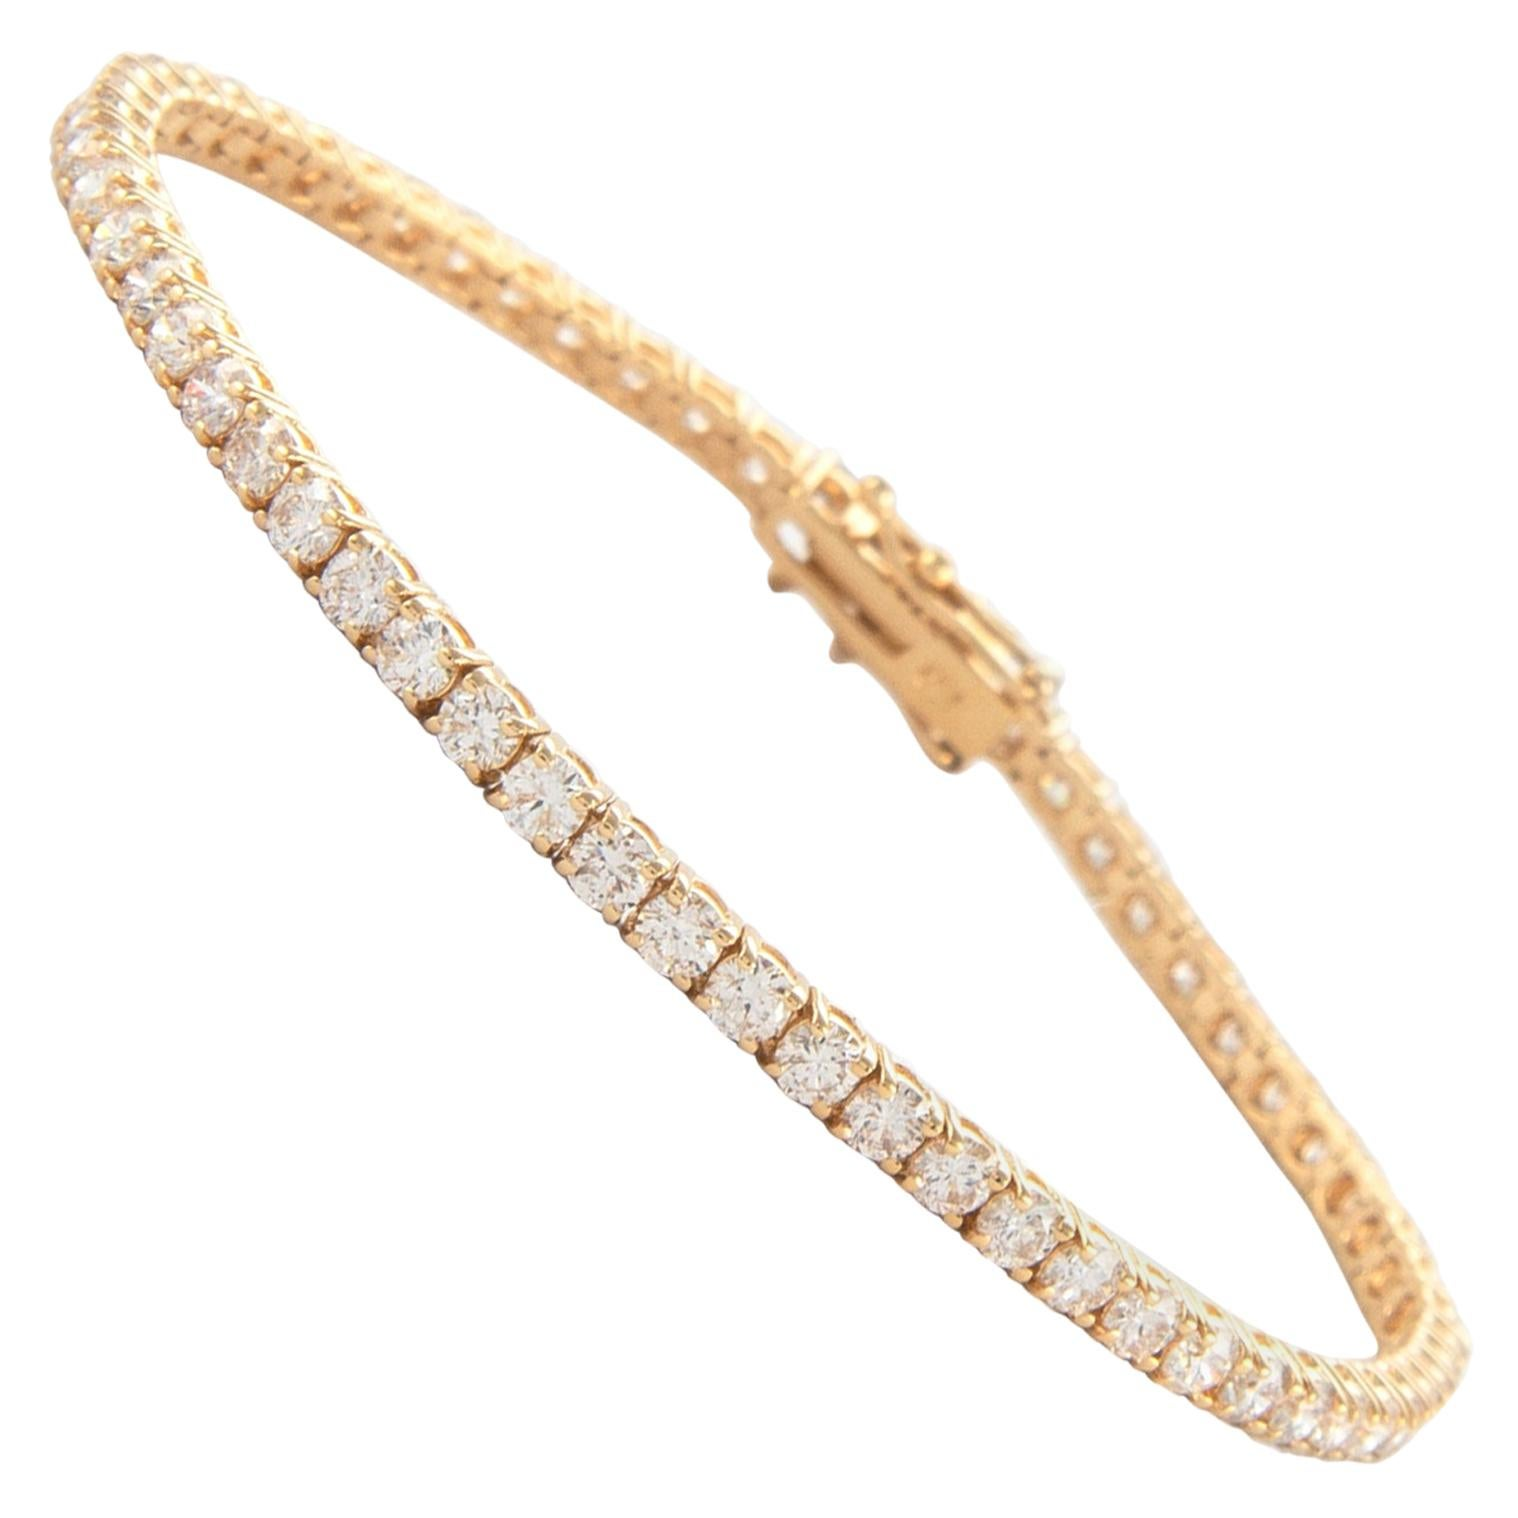 Alexander 5.12 Carat Diamond Tennis Bracelet 18 Karat Yellow Gold